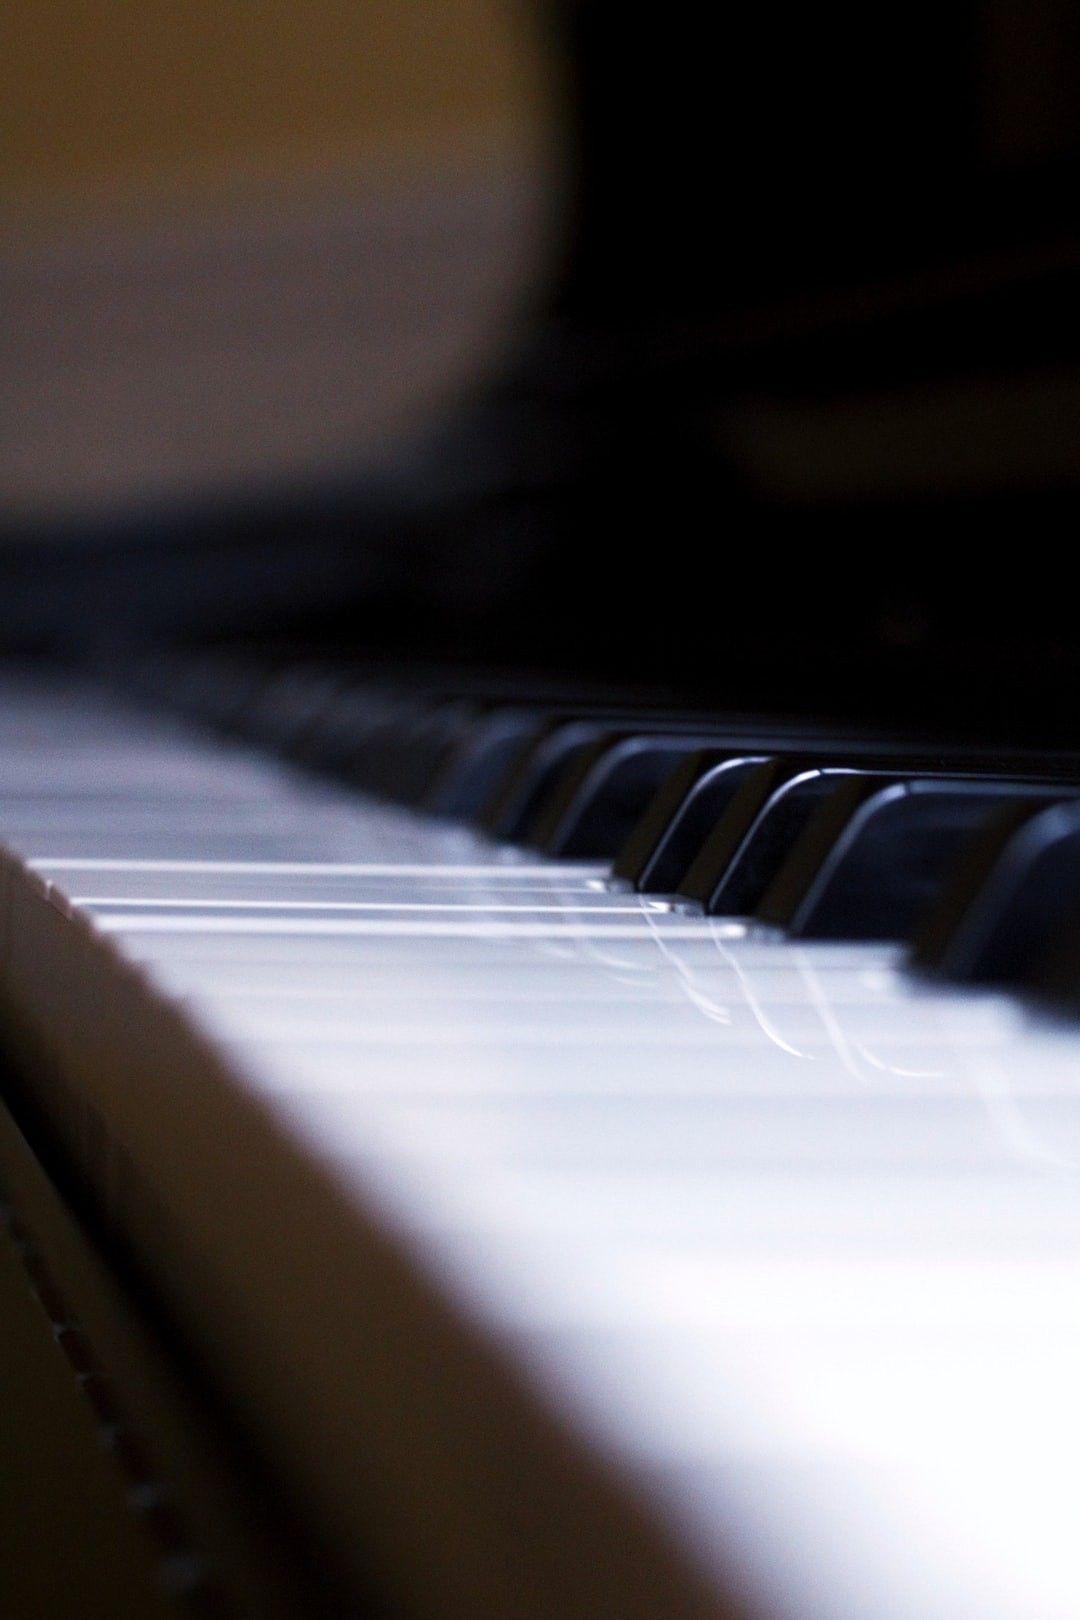 Piano Keys Hd Wallpaper Piano Pictures Piano Piano Keys Hd wallpaper piano keys macro musical